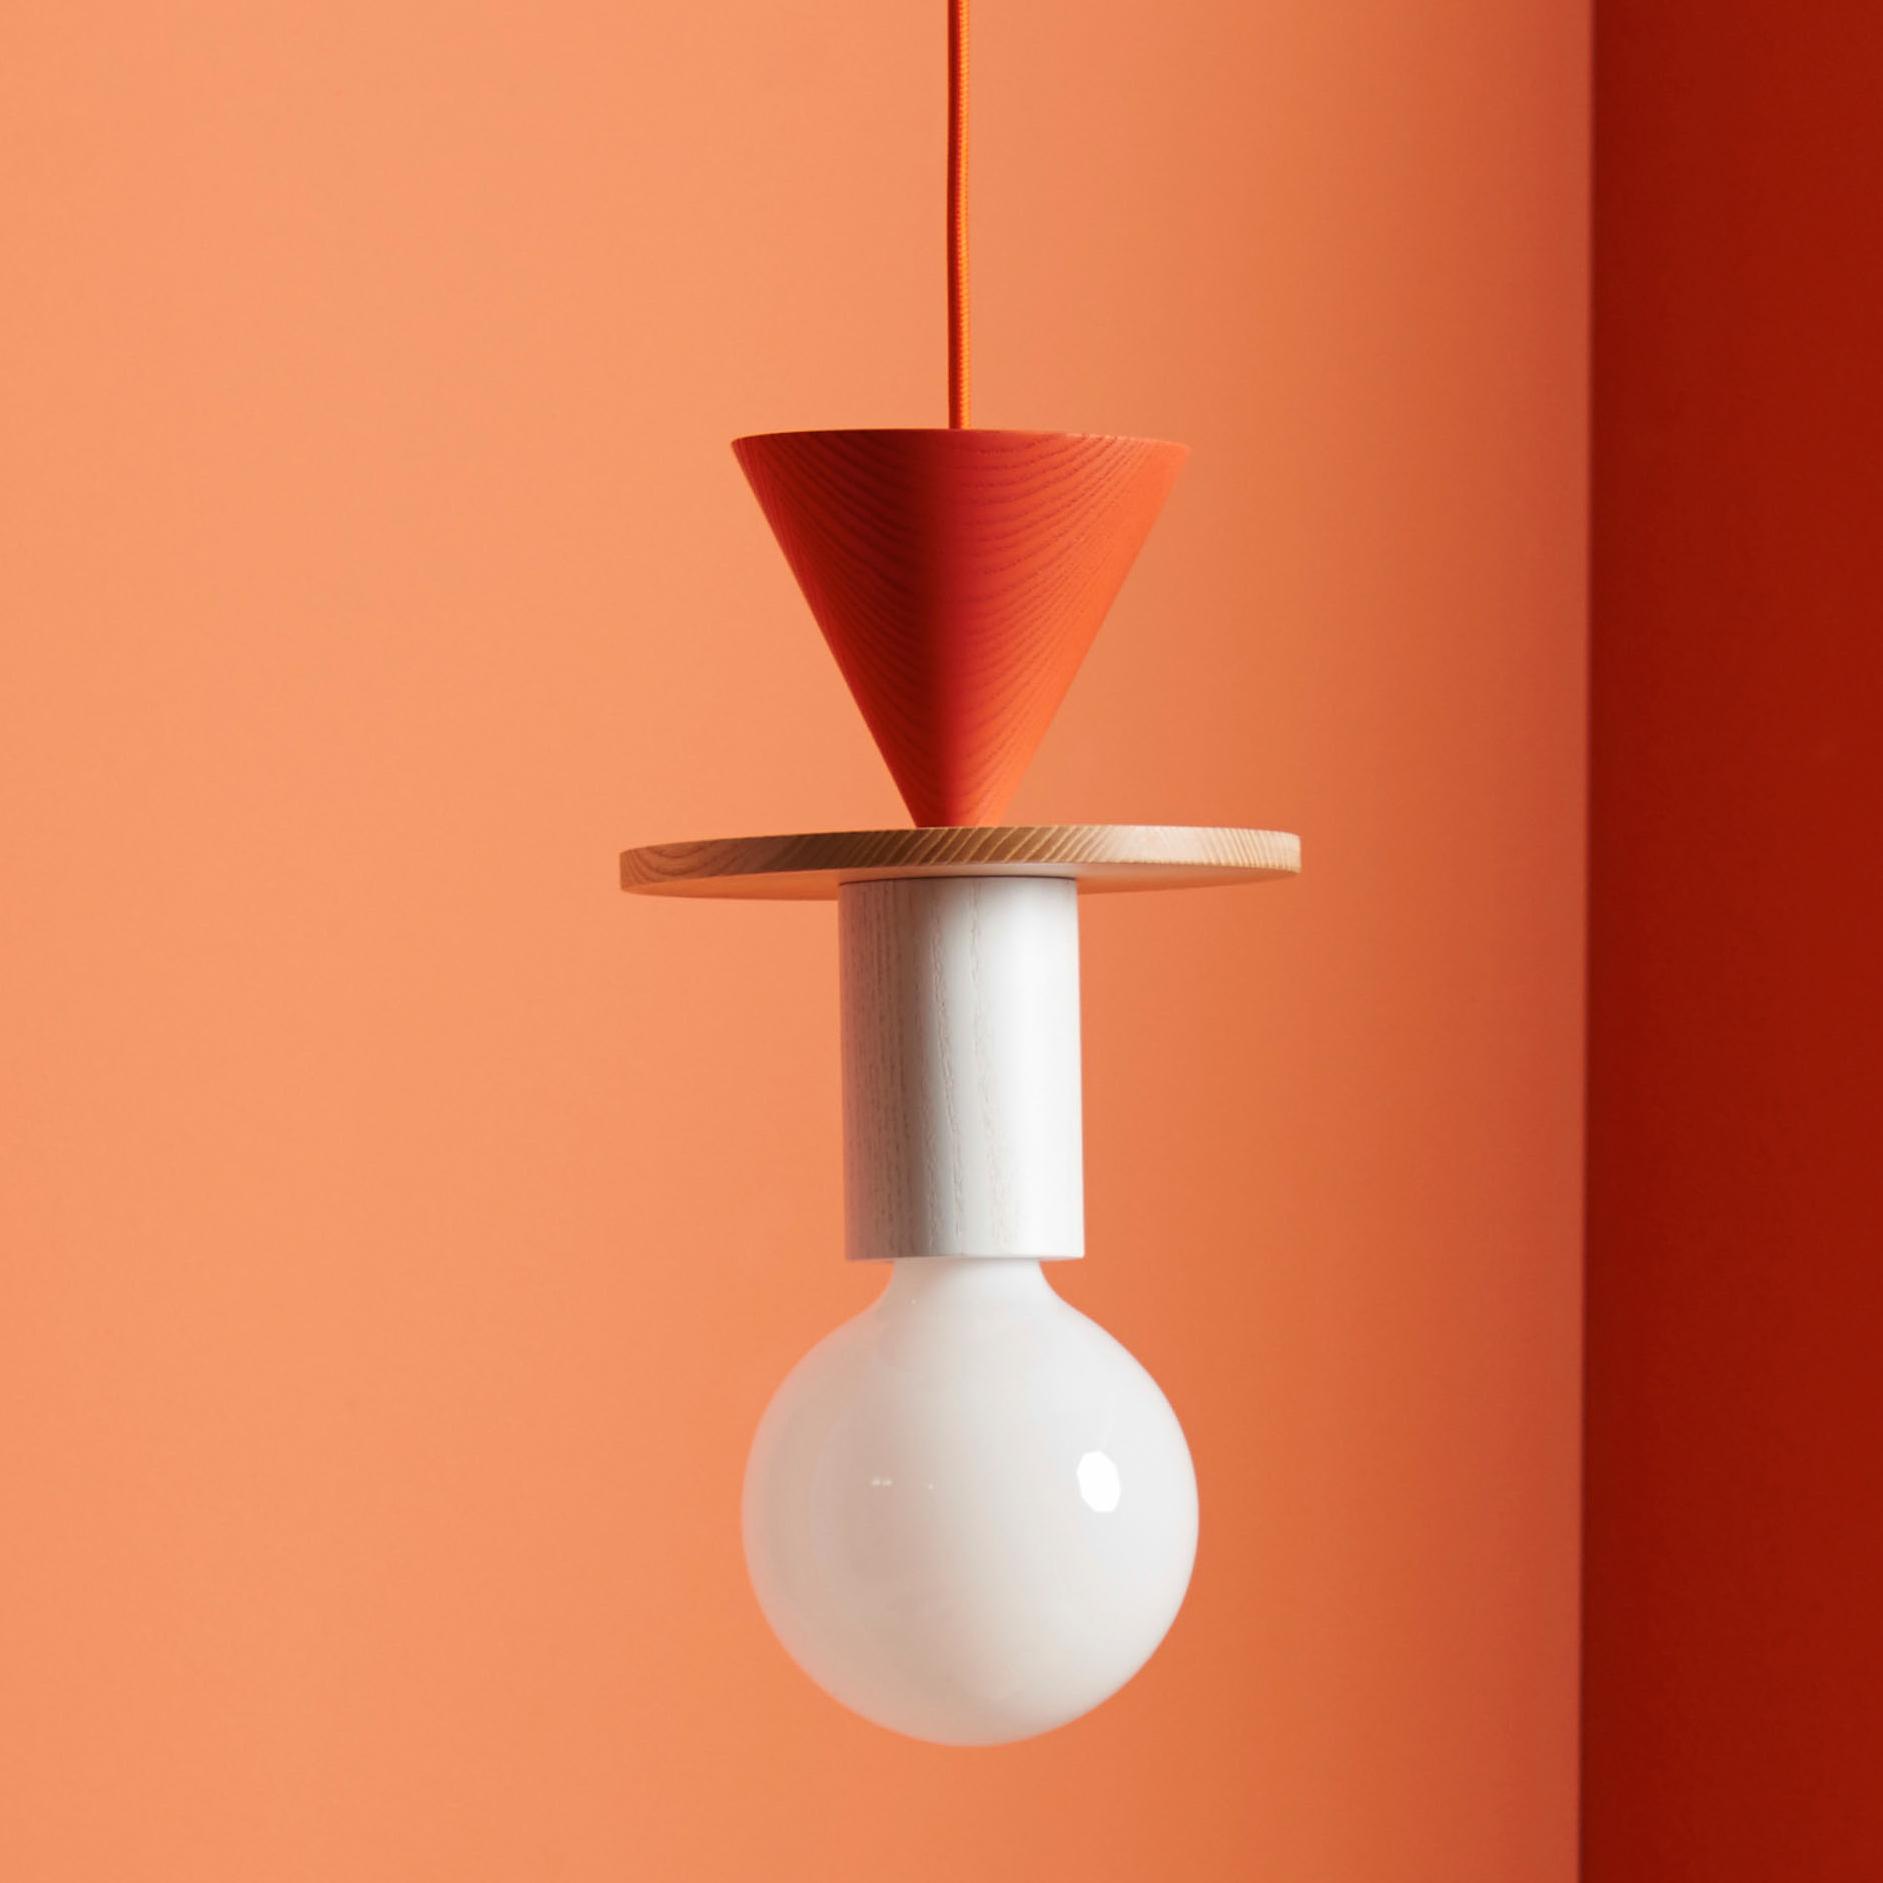 suspension junit record fr ne rouge h25cm schneid luminaires nedgis. Black Bedroom Furniture Sets. Home Design Ideas